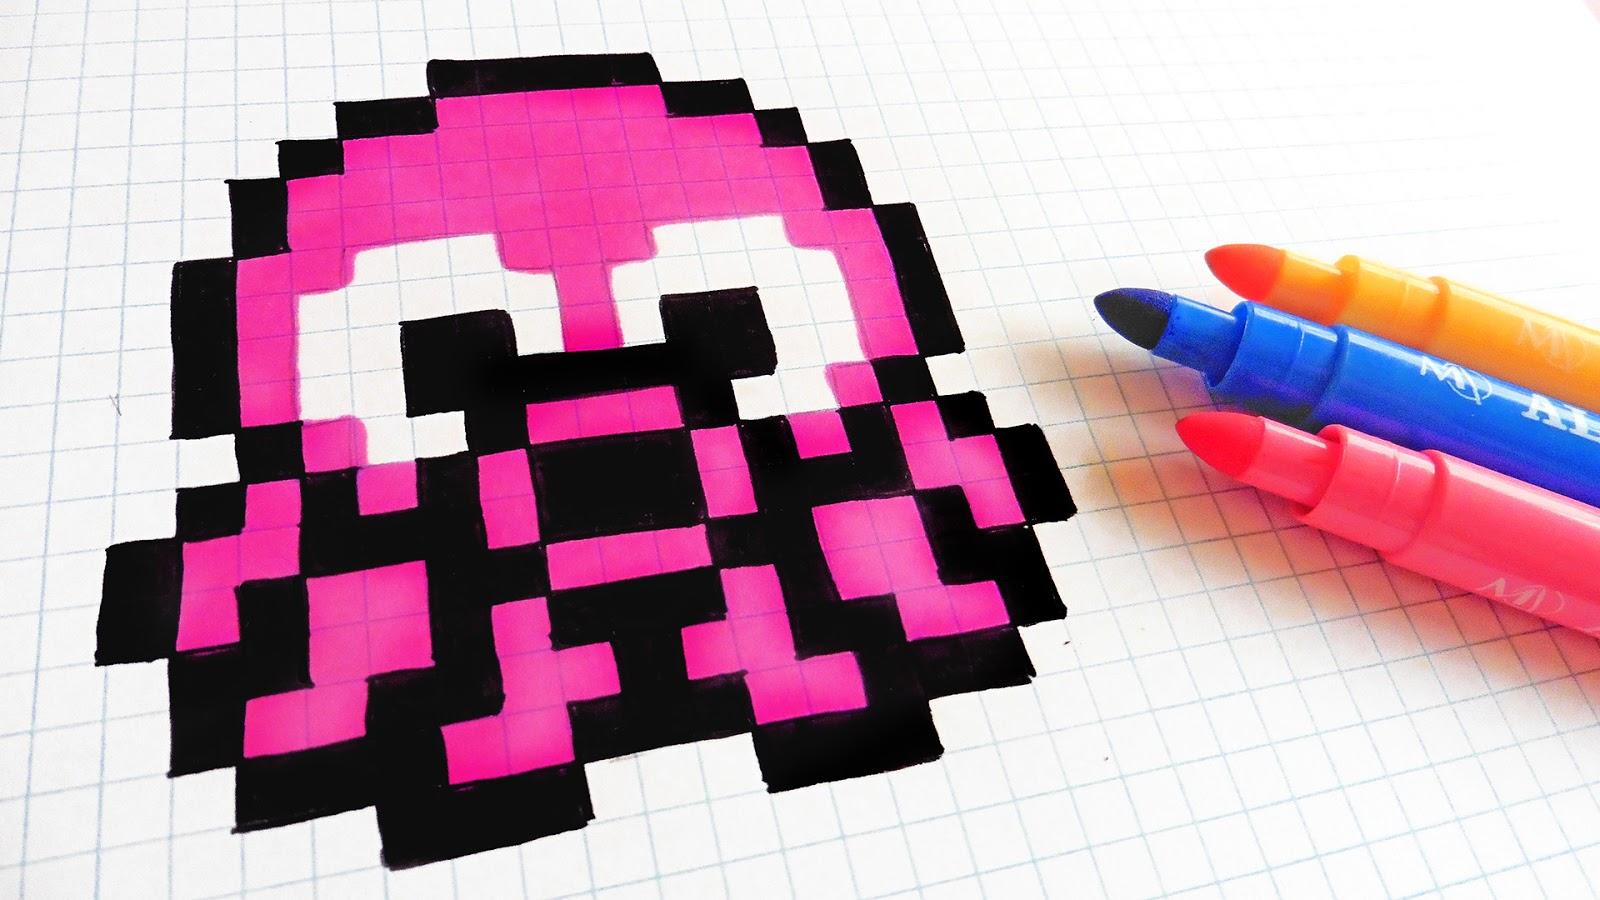 Pastel Pixel Art Cute Things T Kawaii Pixel Art Games And